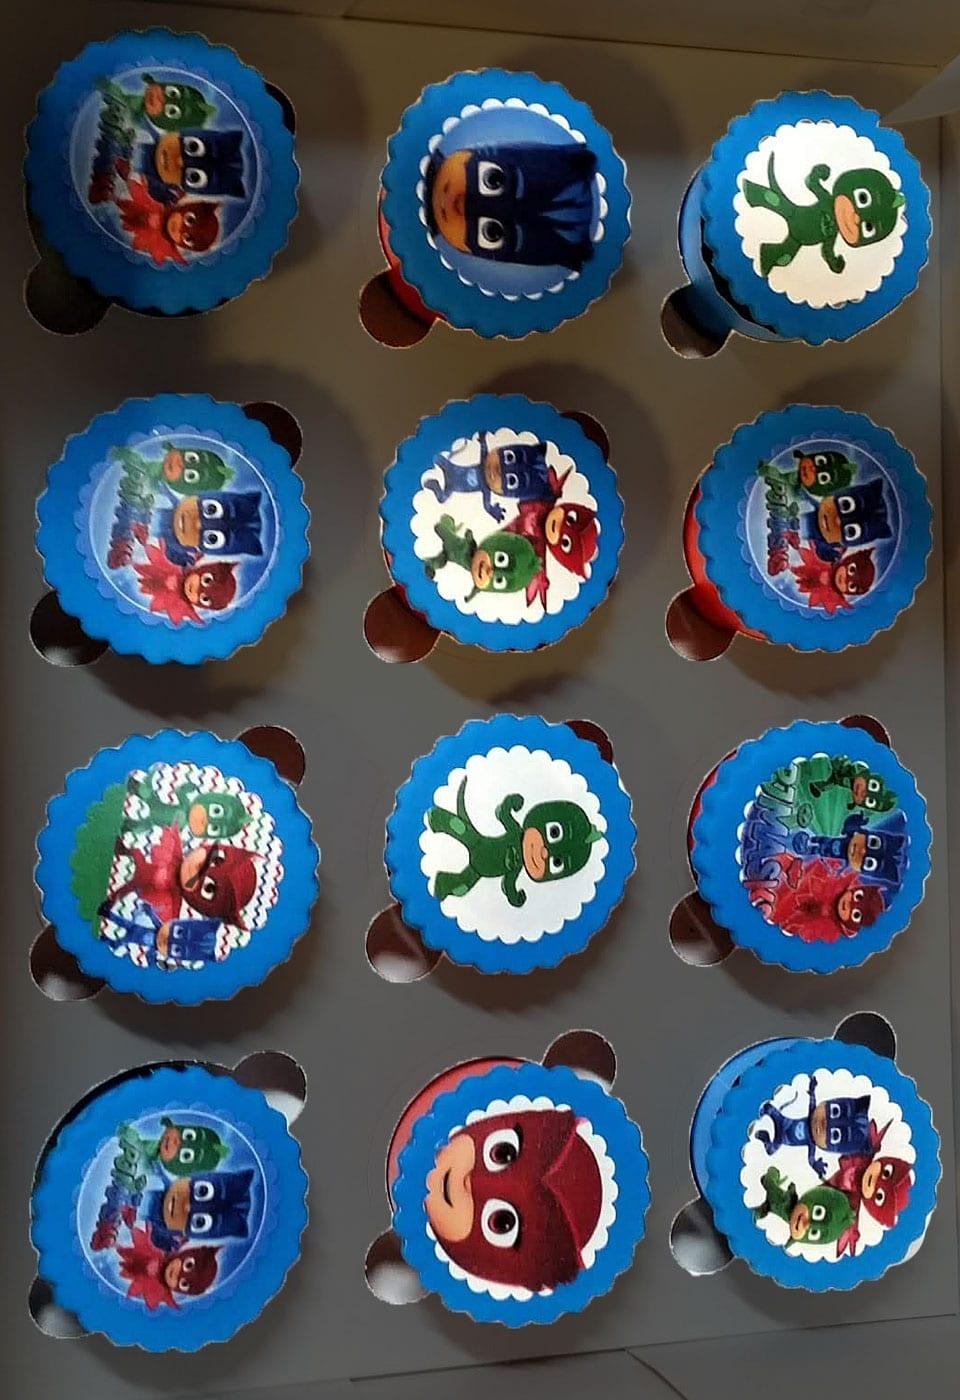 קאפקייקס כוח פיג׳יי PJ Masks